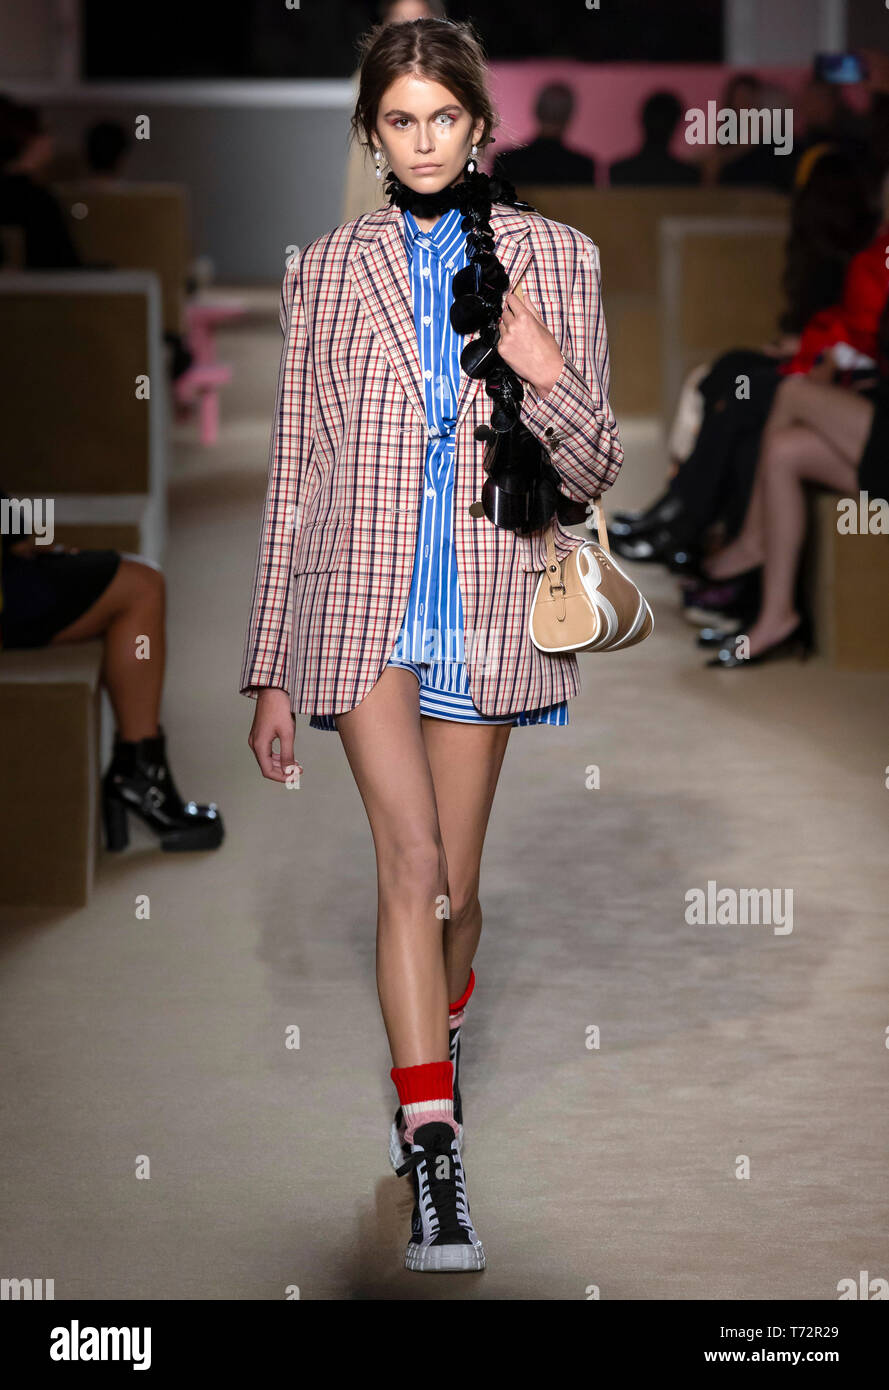 New York, NY - May 02 2019: Kaia Gerber walks the runway